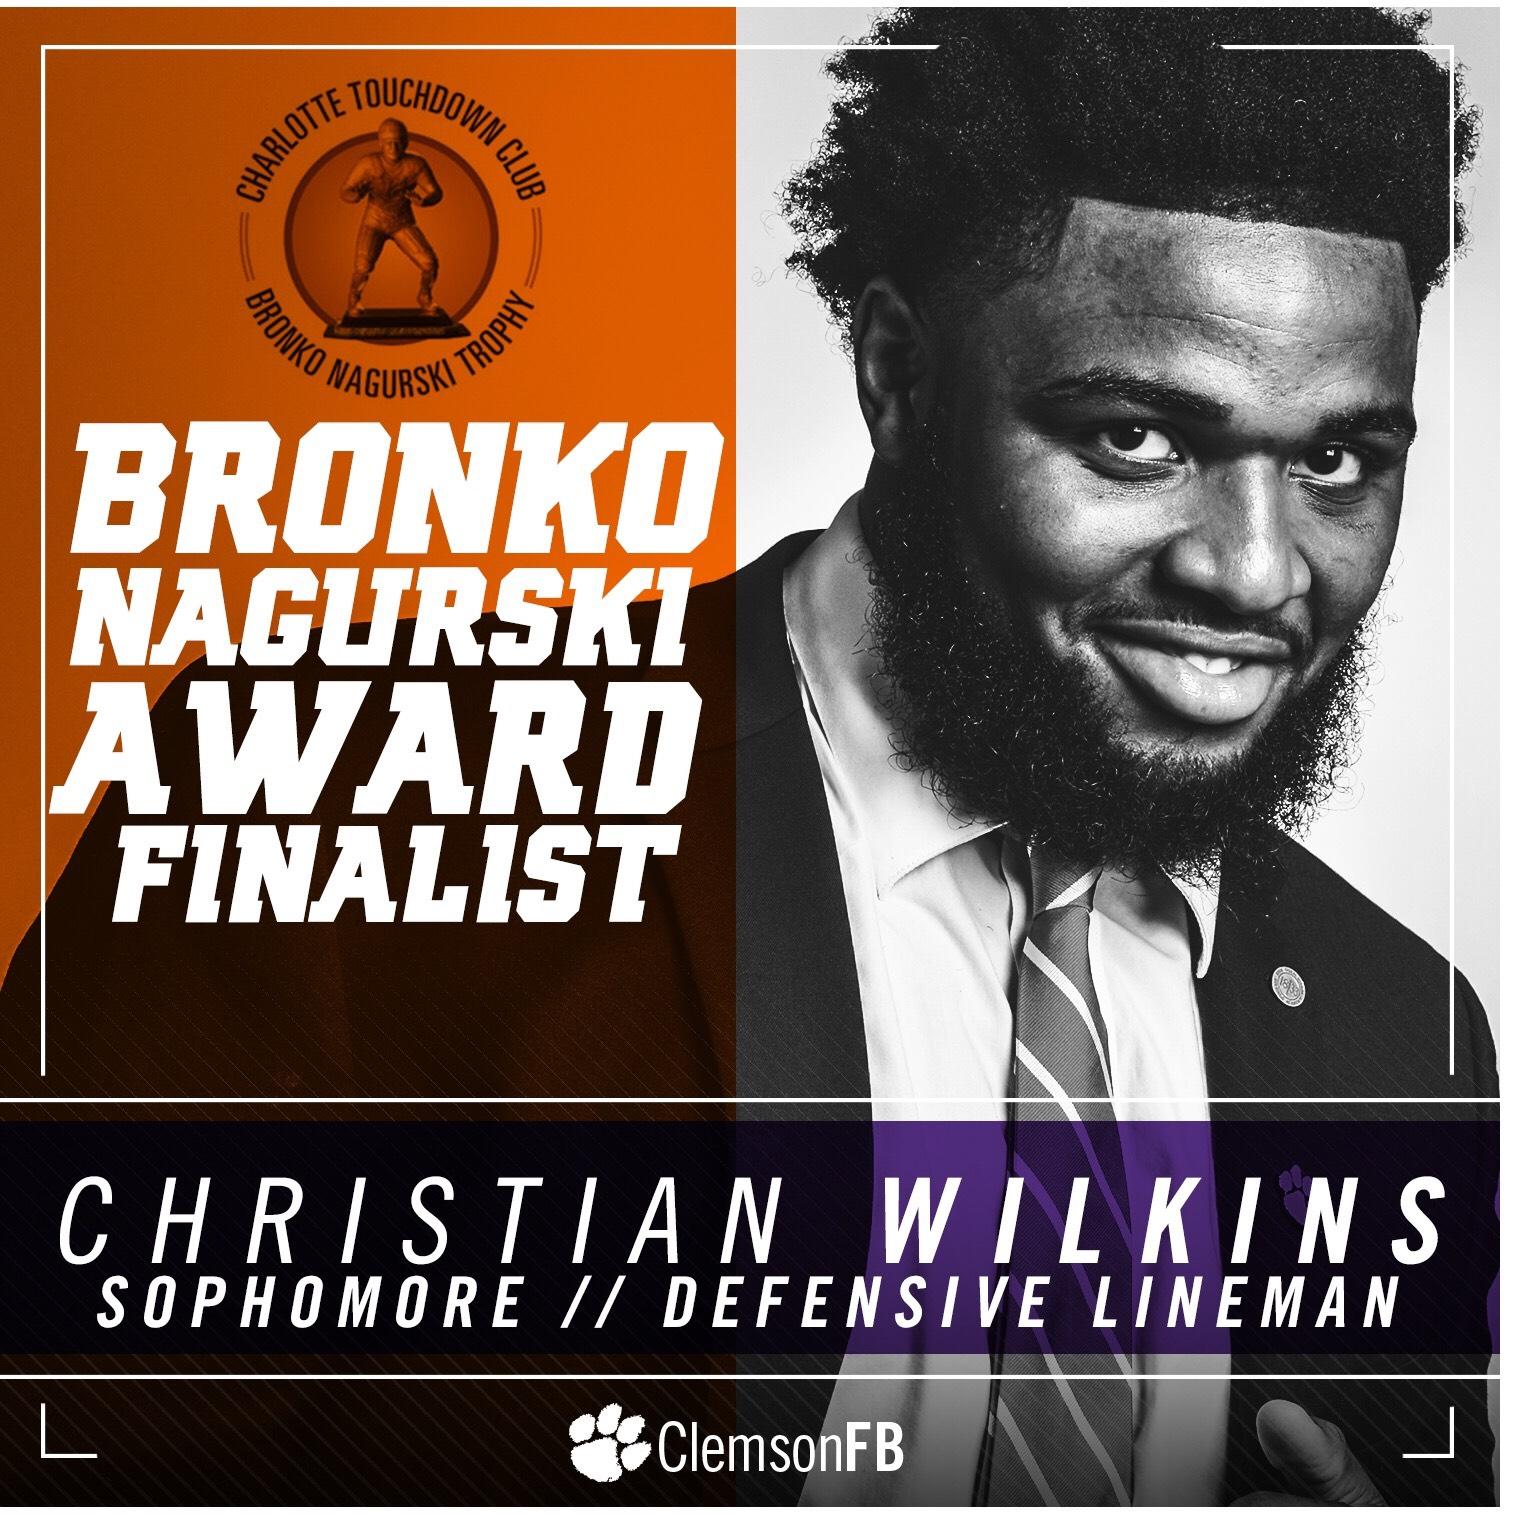 Wilkins Finalist for Nagurski Award